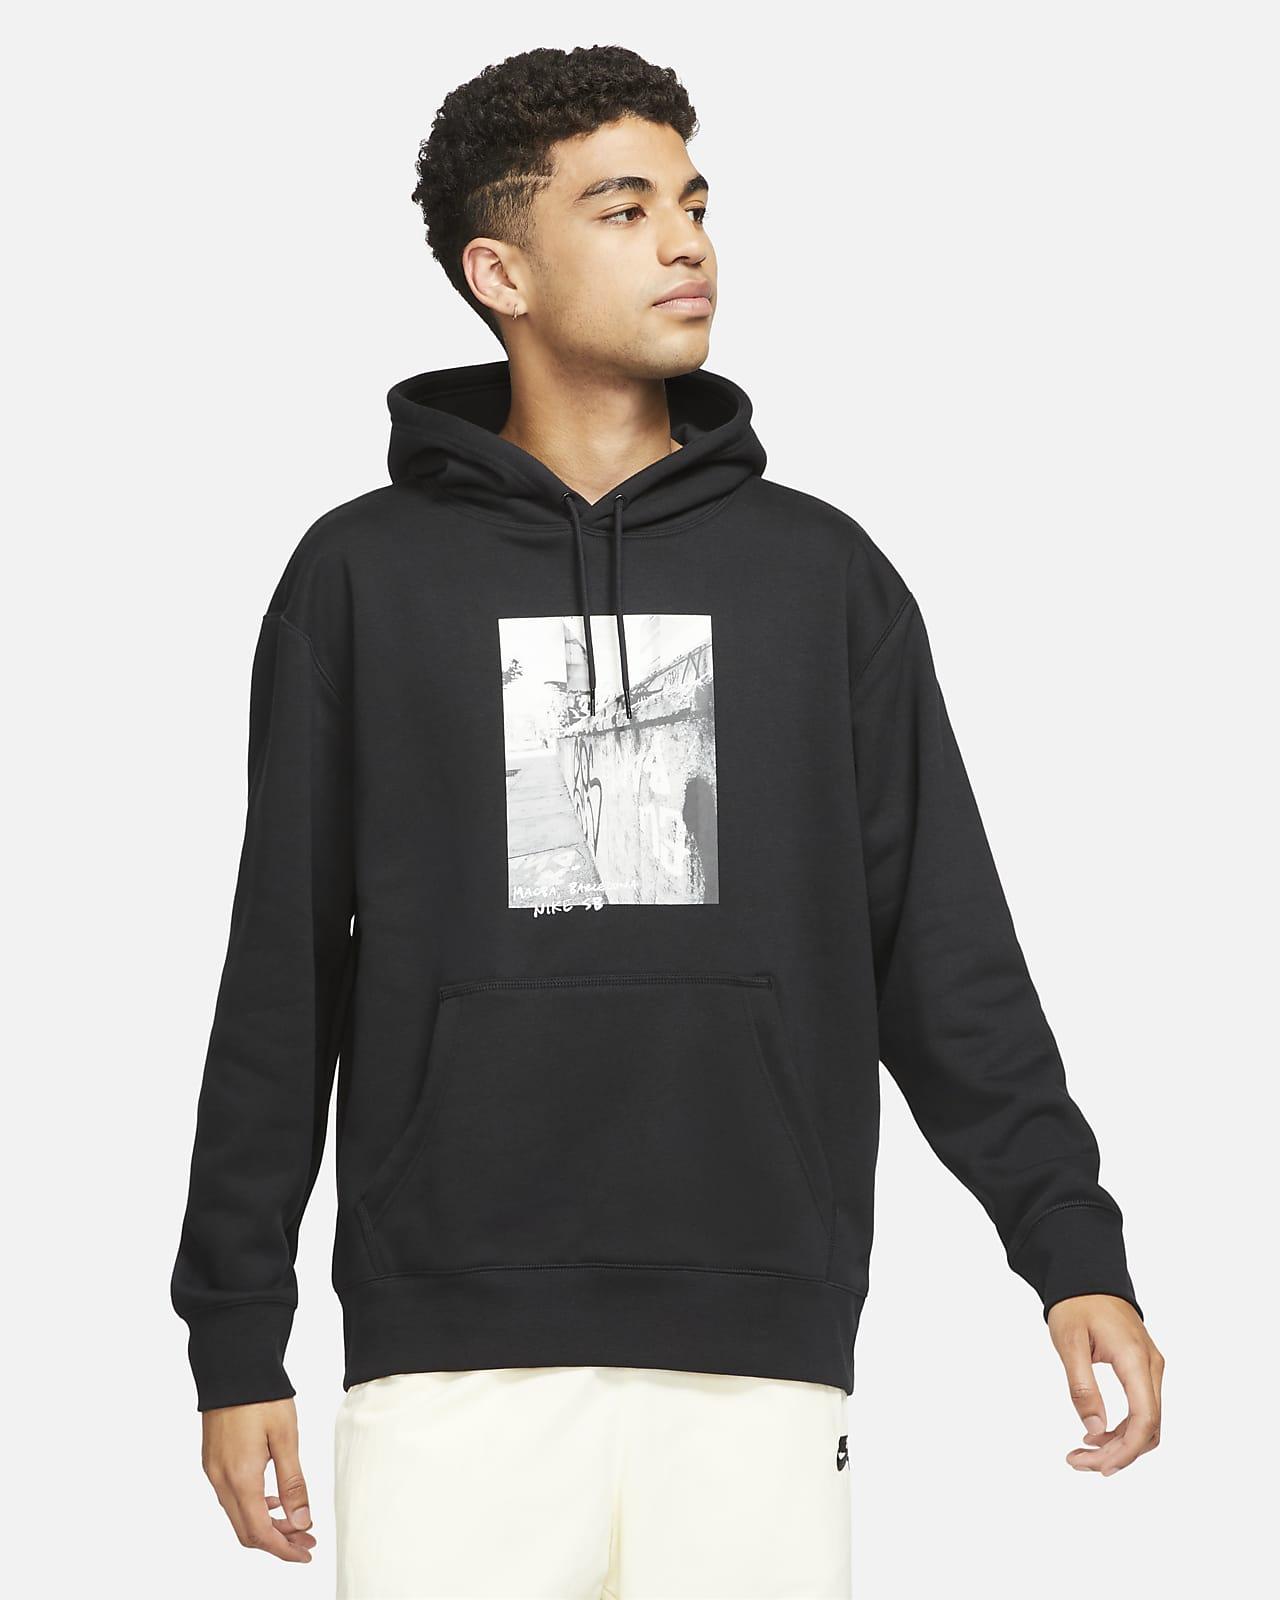 Bluza z kapturem i grafiką do skateboardingu Nike SB